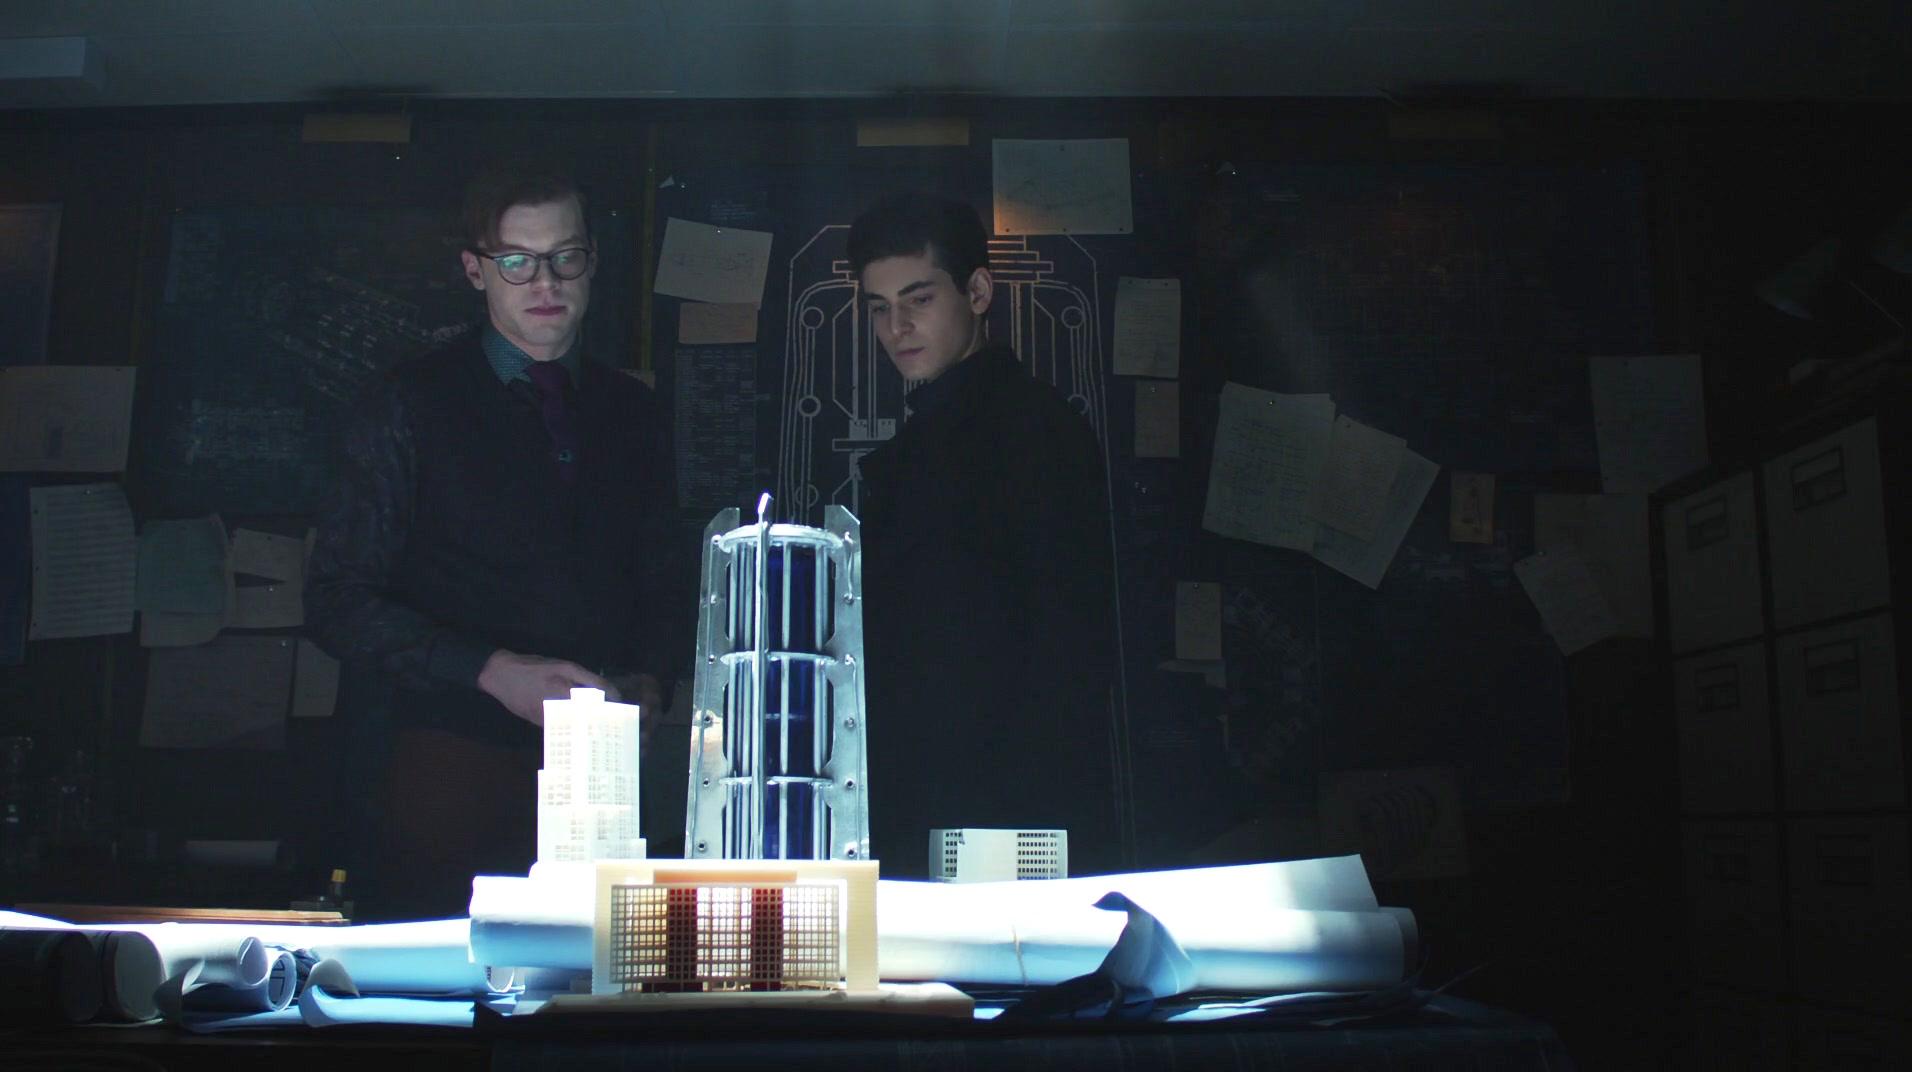 Cameron Monaghan and David Mazouz in Gotham (2014)